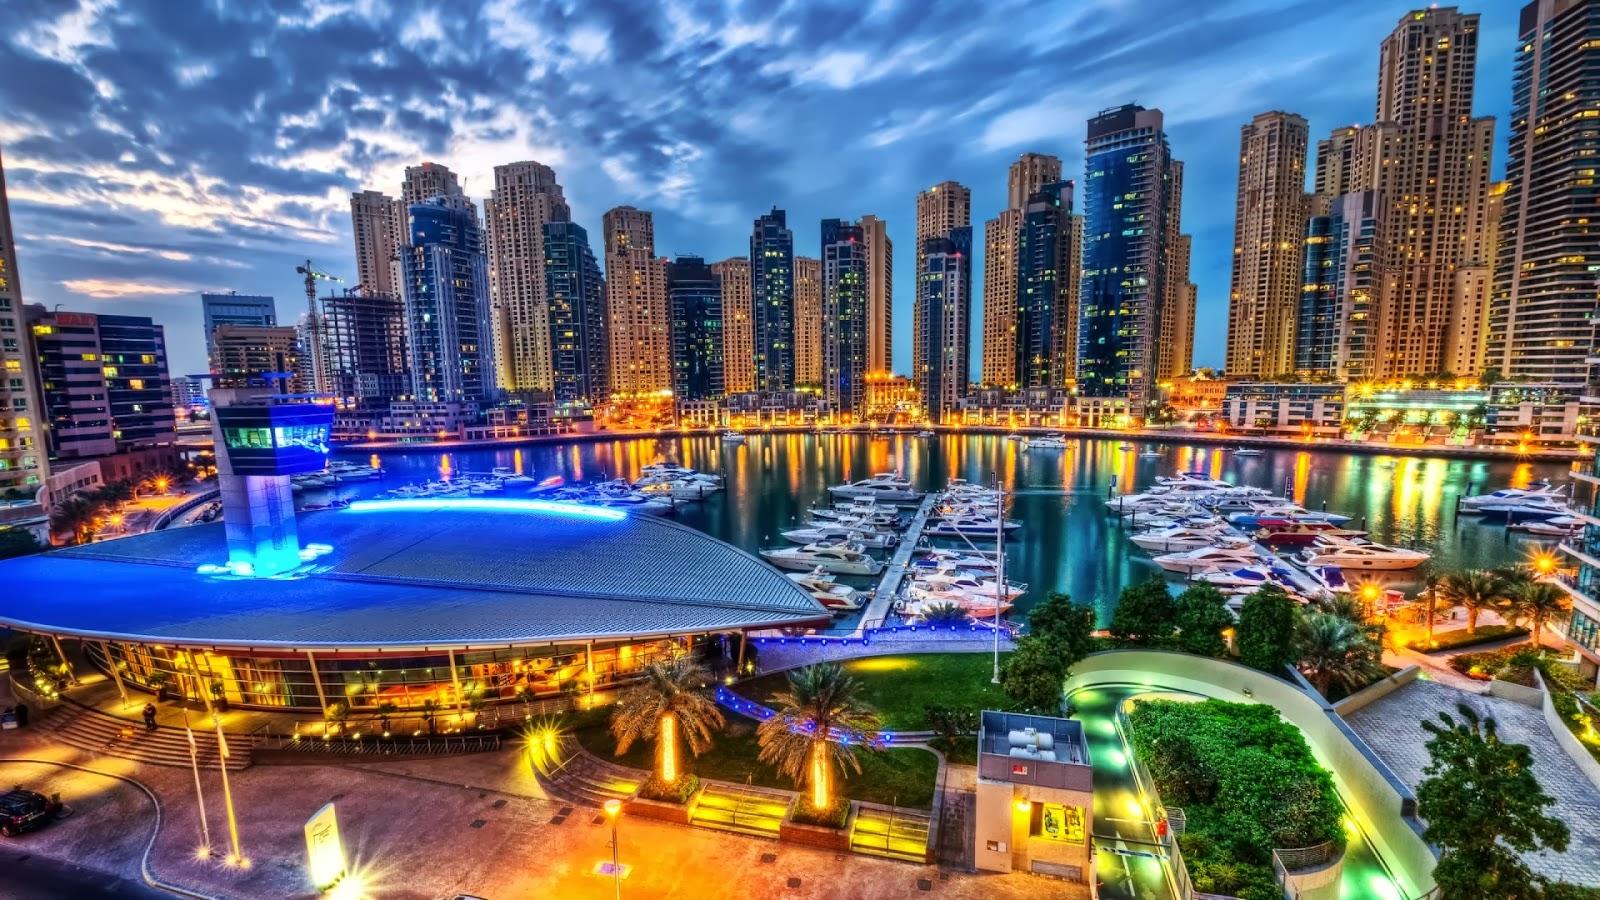 building hd wallpapers 1080p: Dubai Wallpaper HD